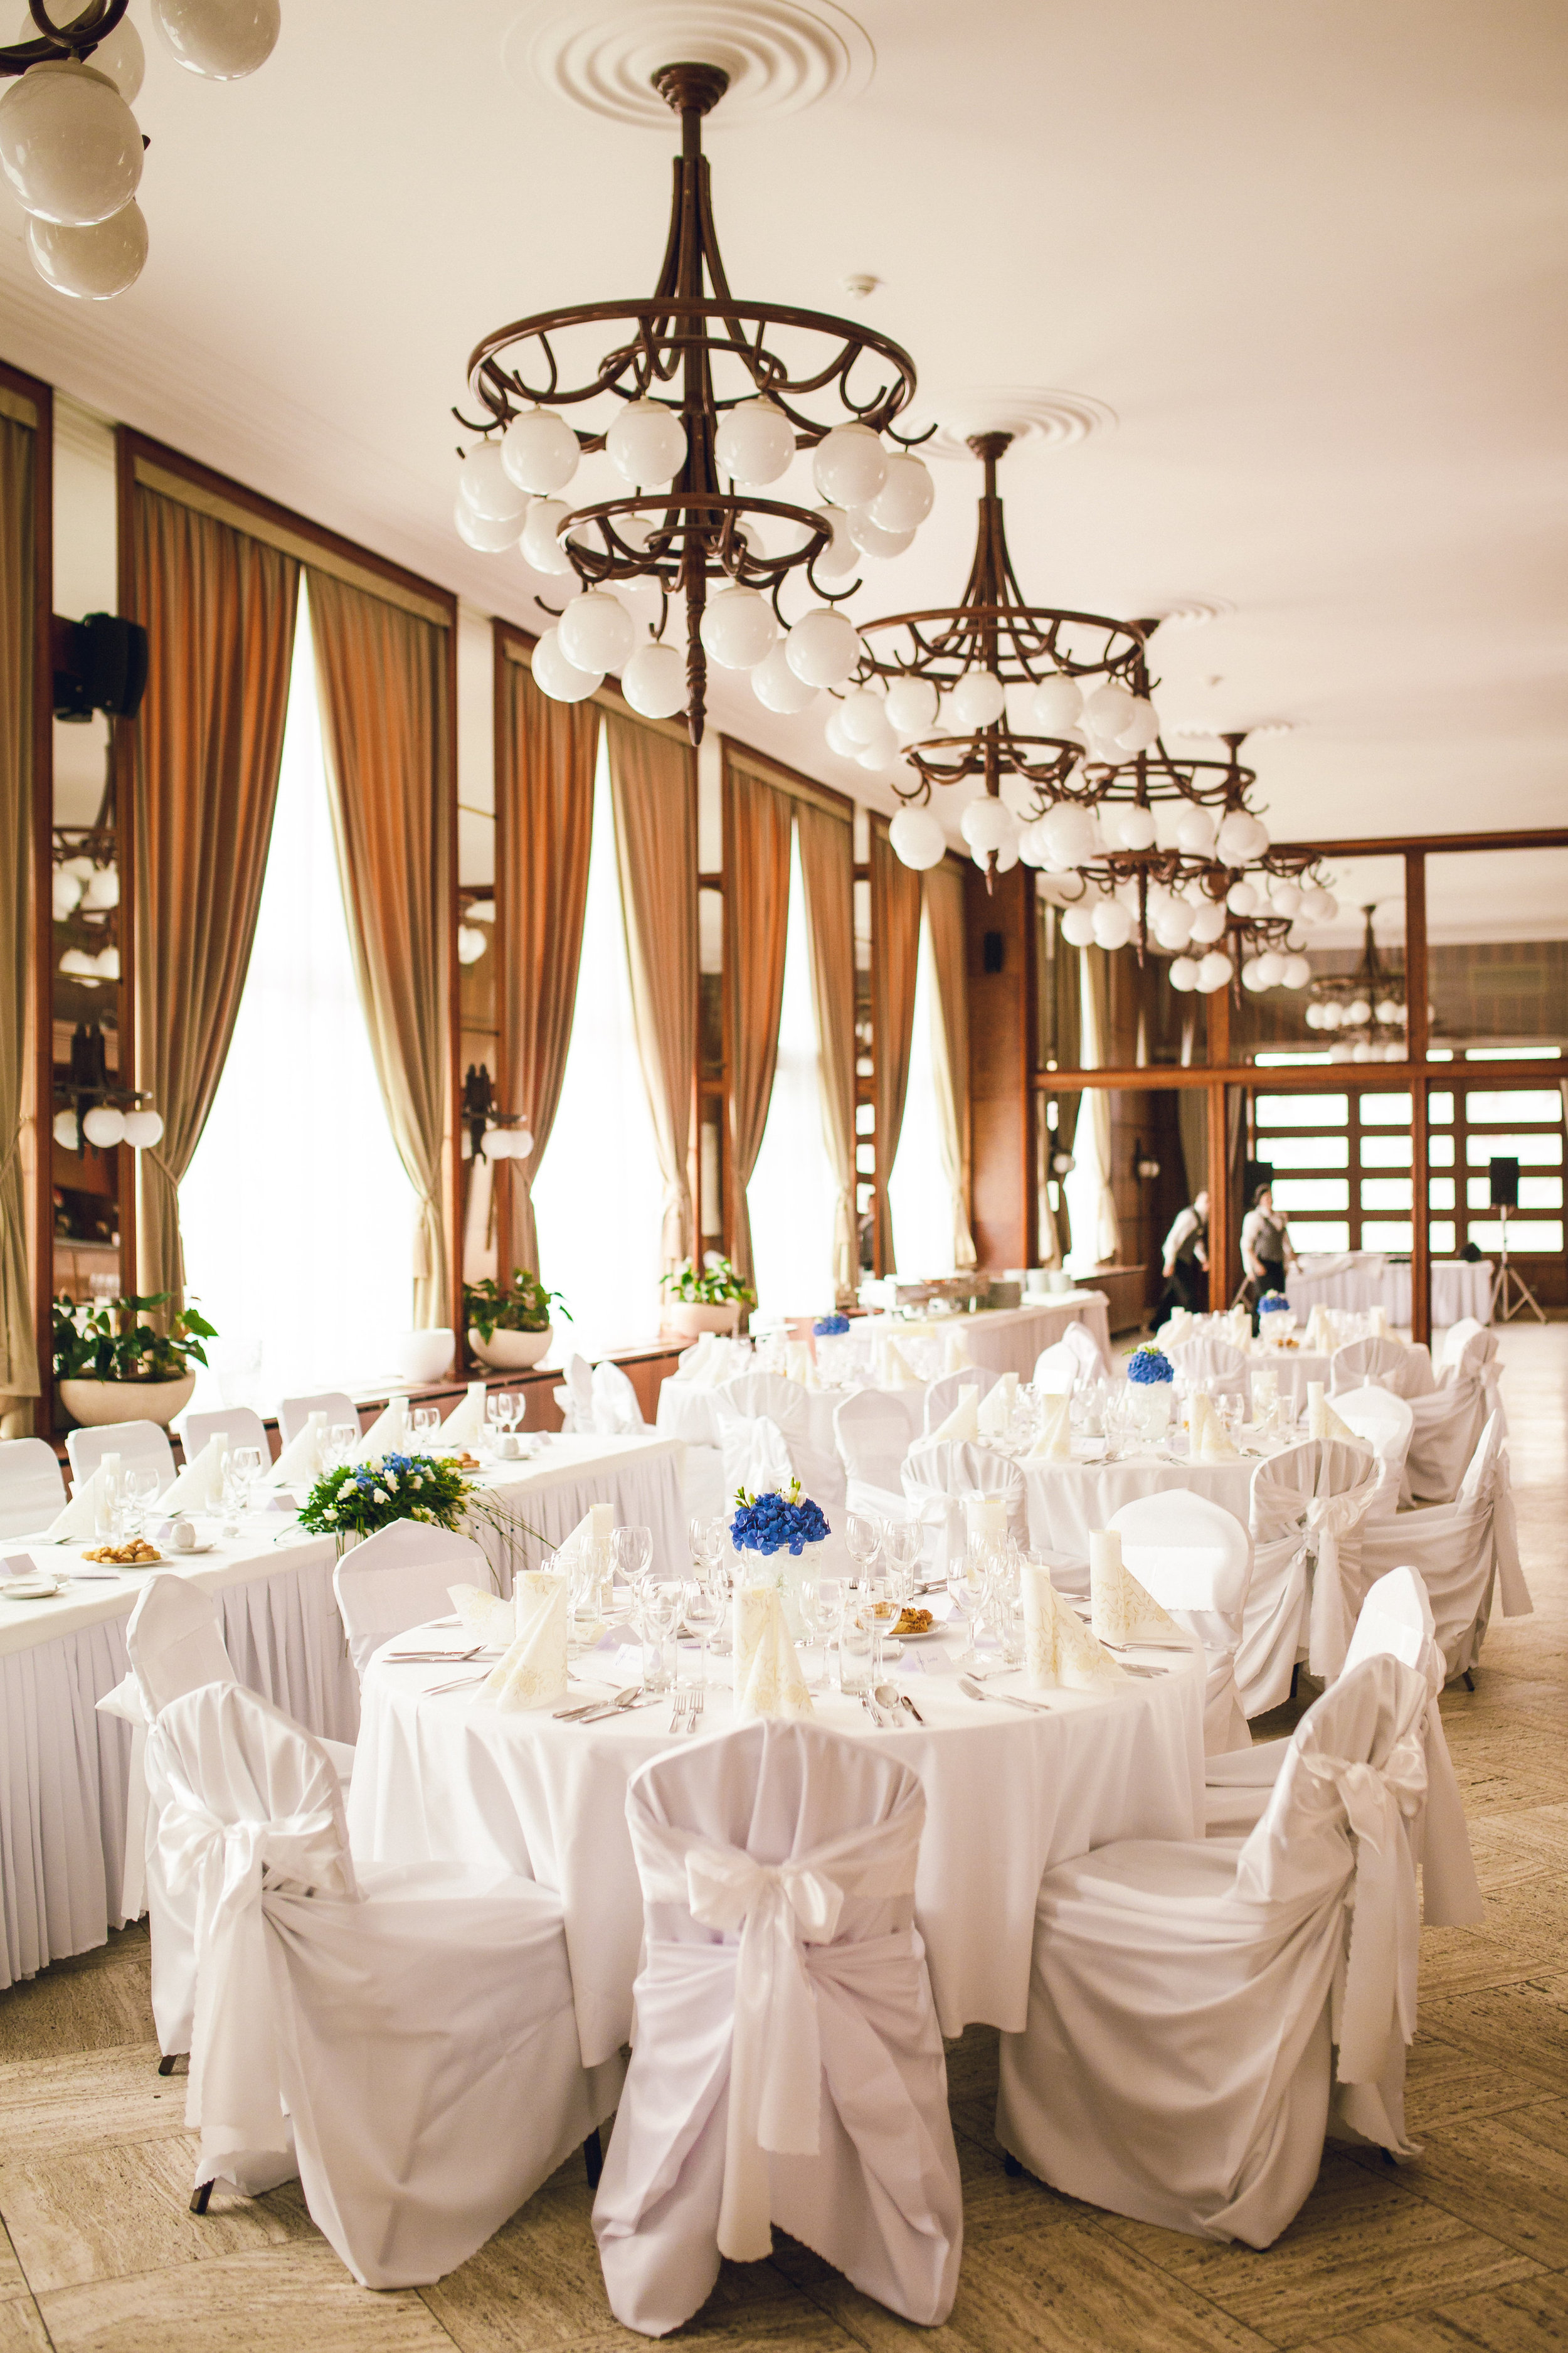 destination-wedding-photographer-slovakia-bratislava-reception-hotel-devin-1.jpg